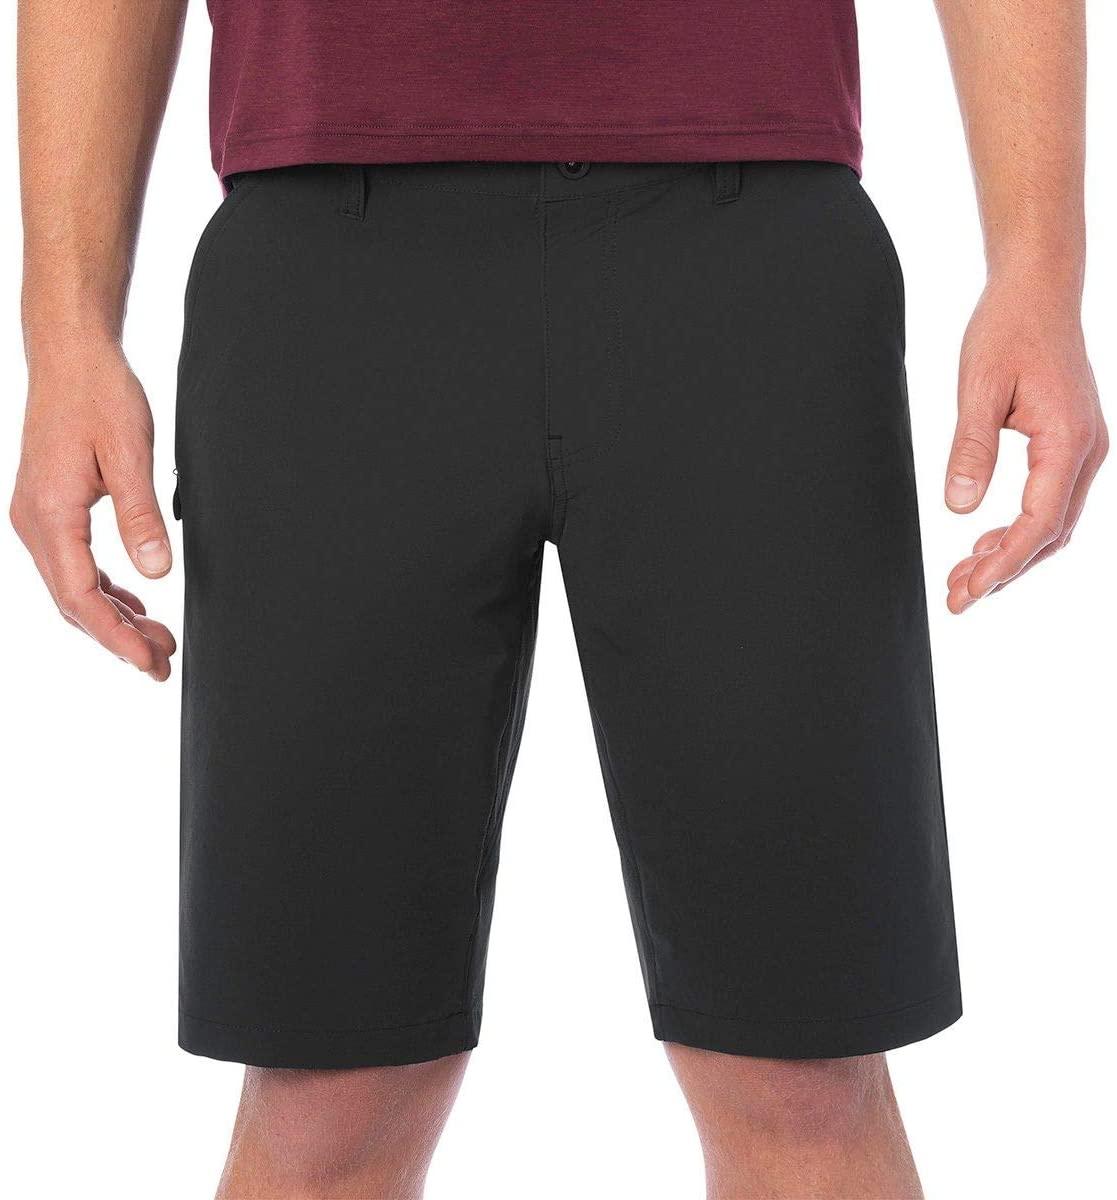 Giro Unisex Venture Short Bag Shorts